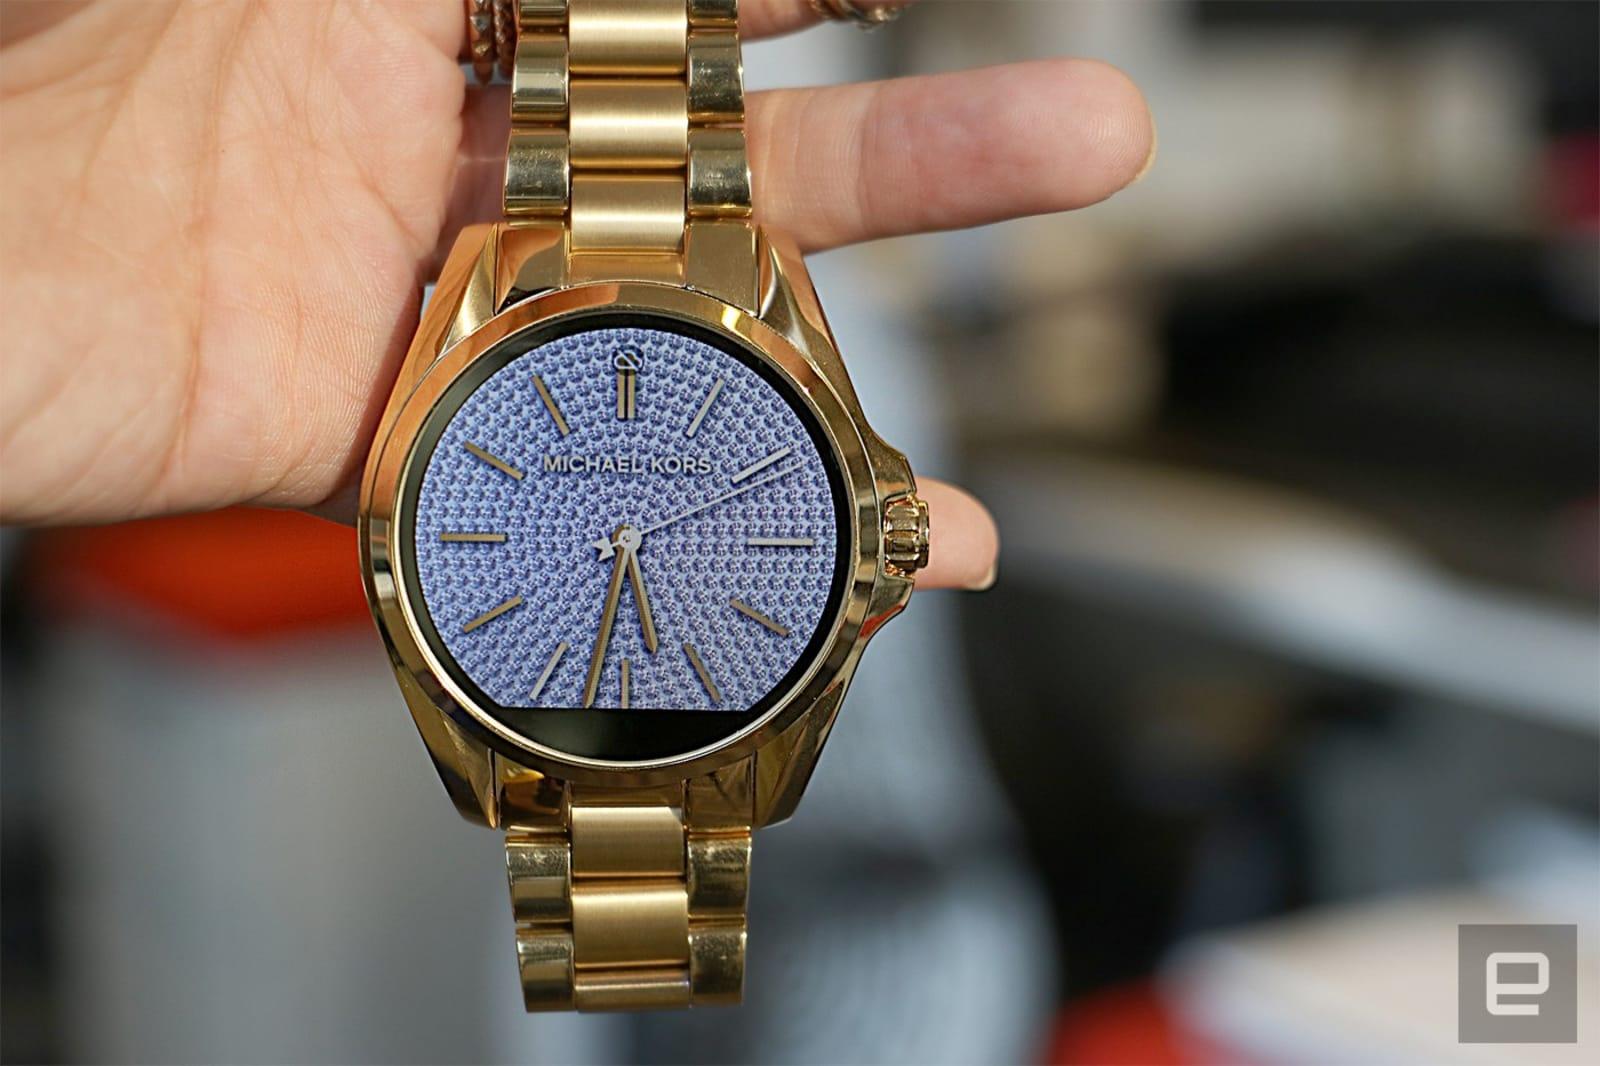 Michael Kors Access smartwatches' value is face deep ...